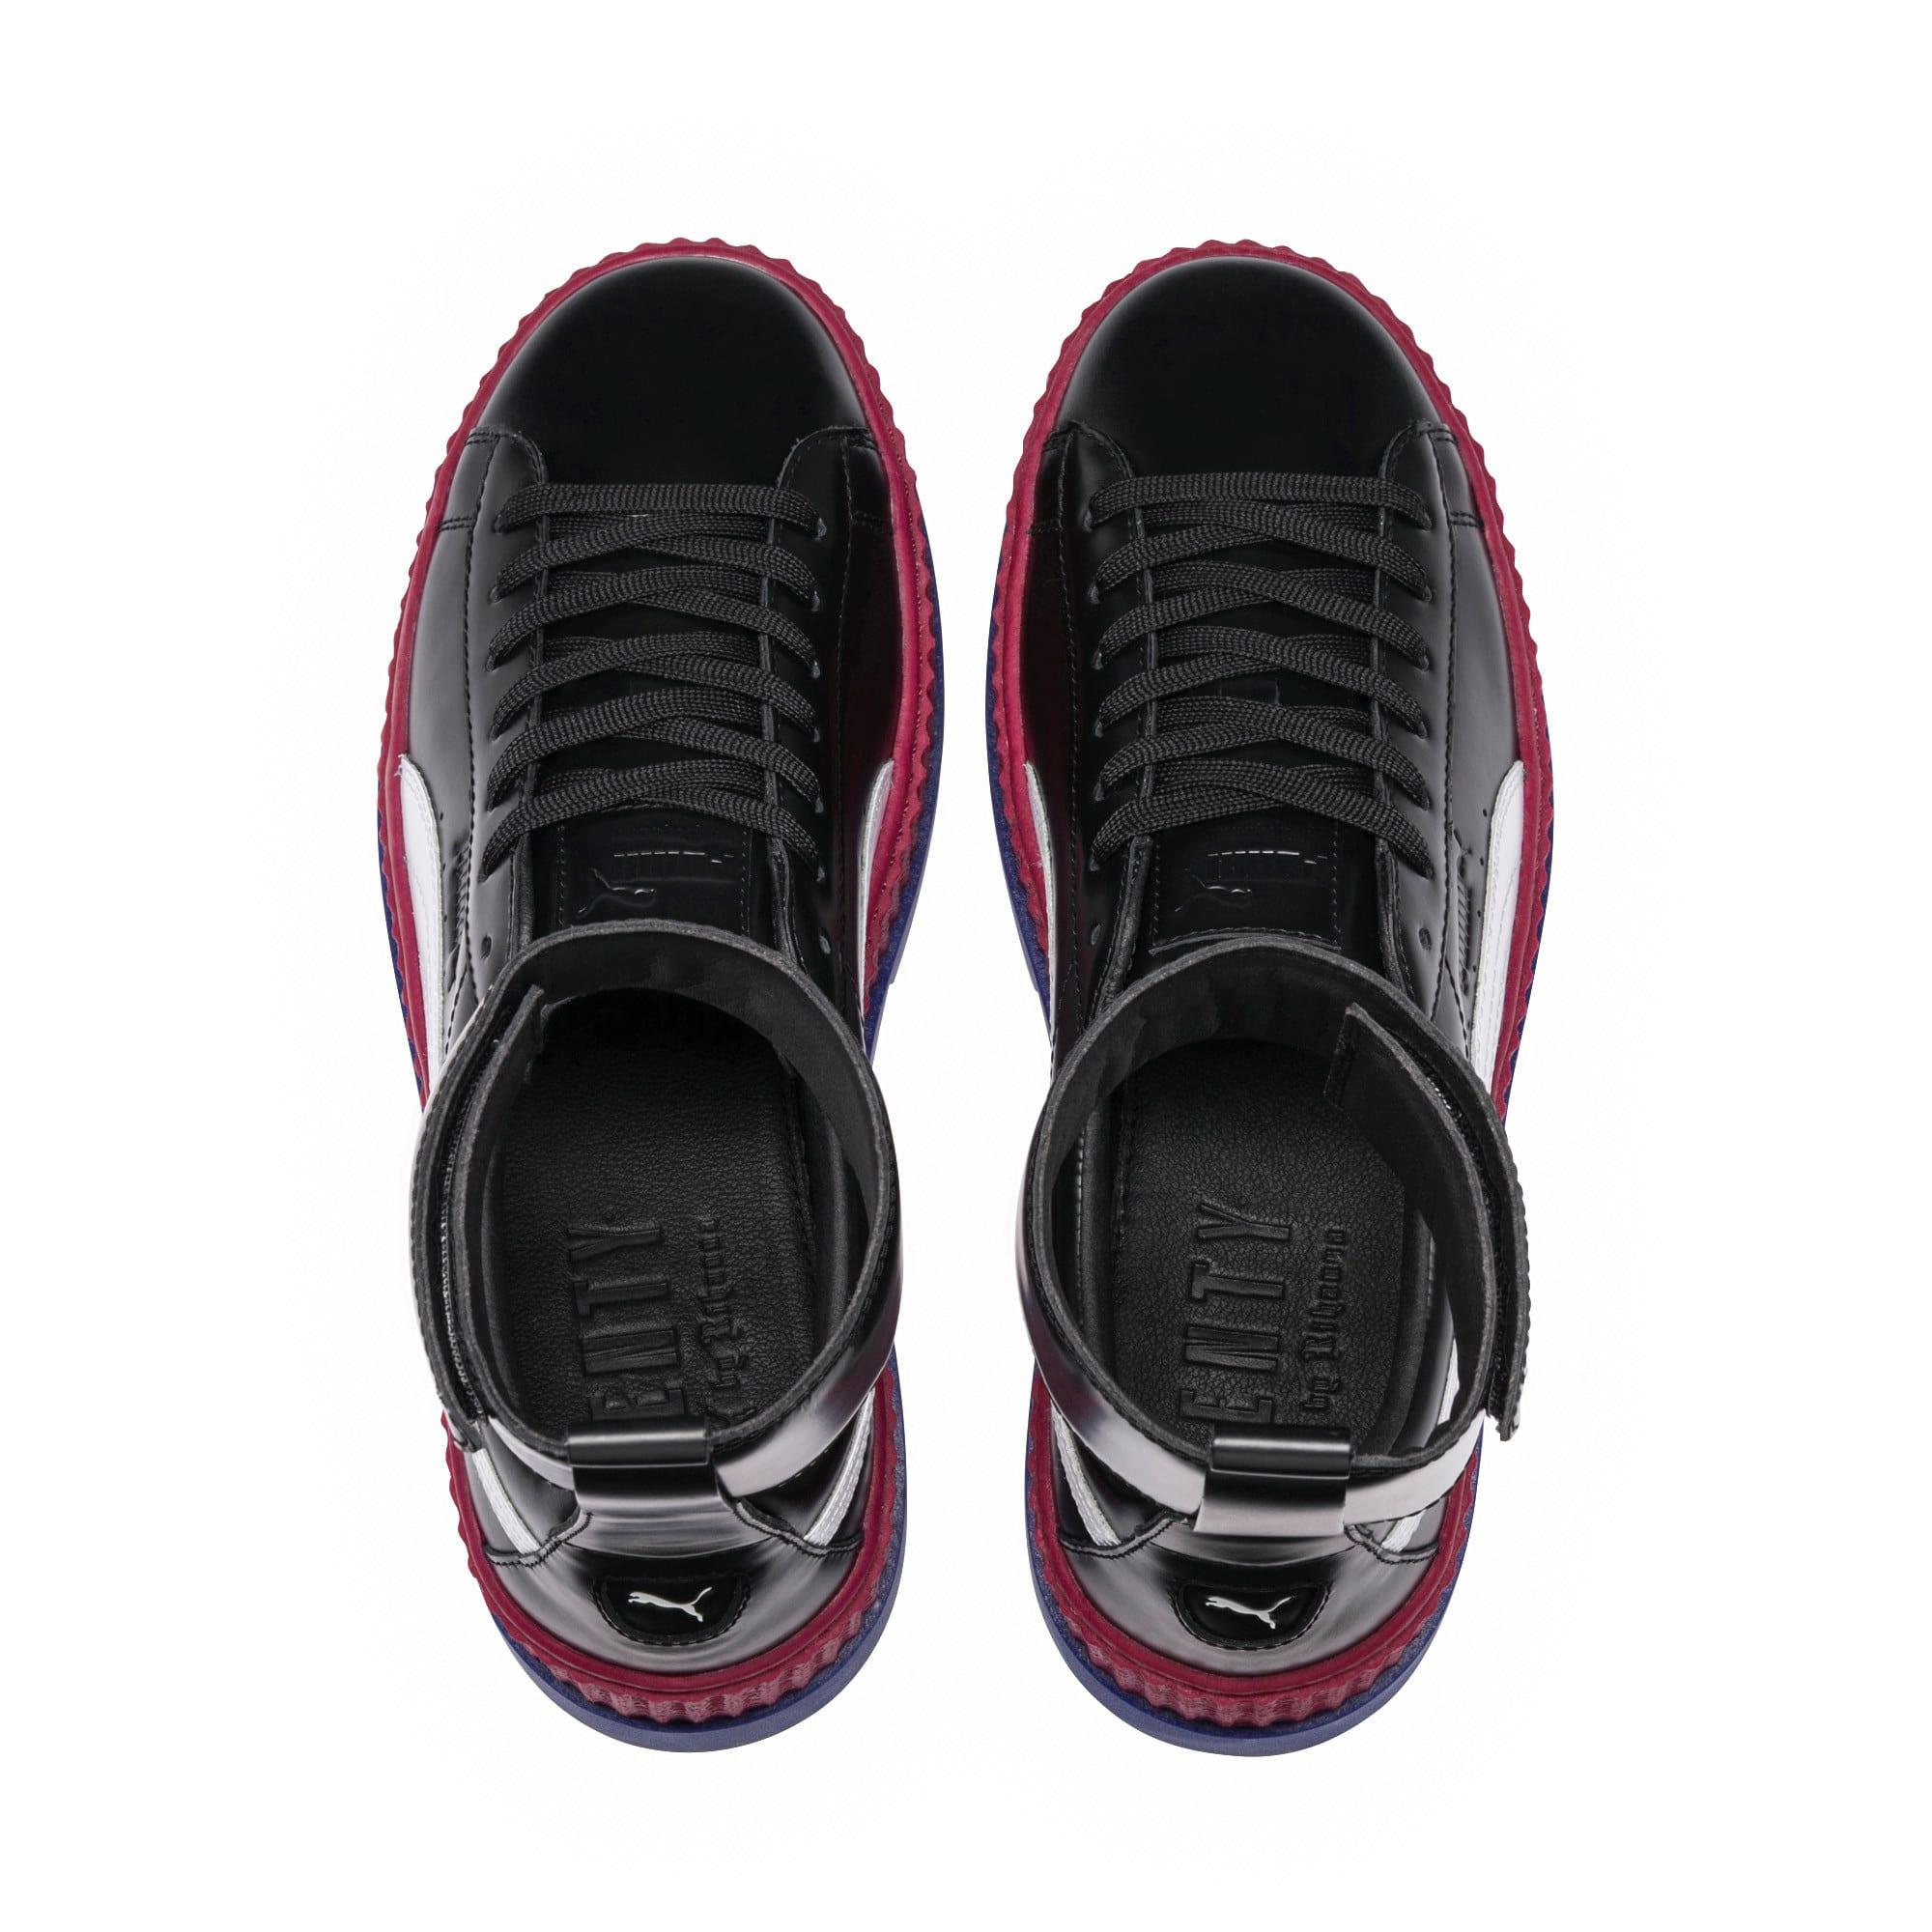 Thumbnail 6 of FENTY Women's Ankle Strap Trainer, Black-White-RedBud-Clematis, medium-IND